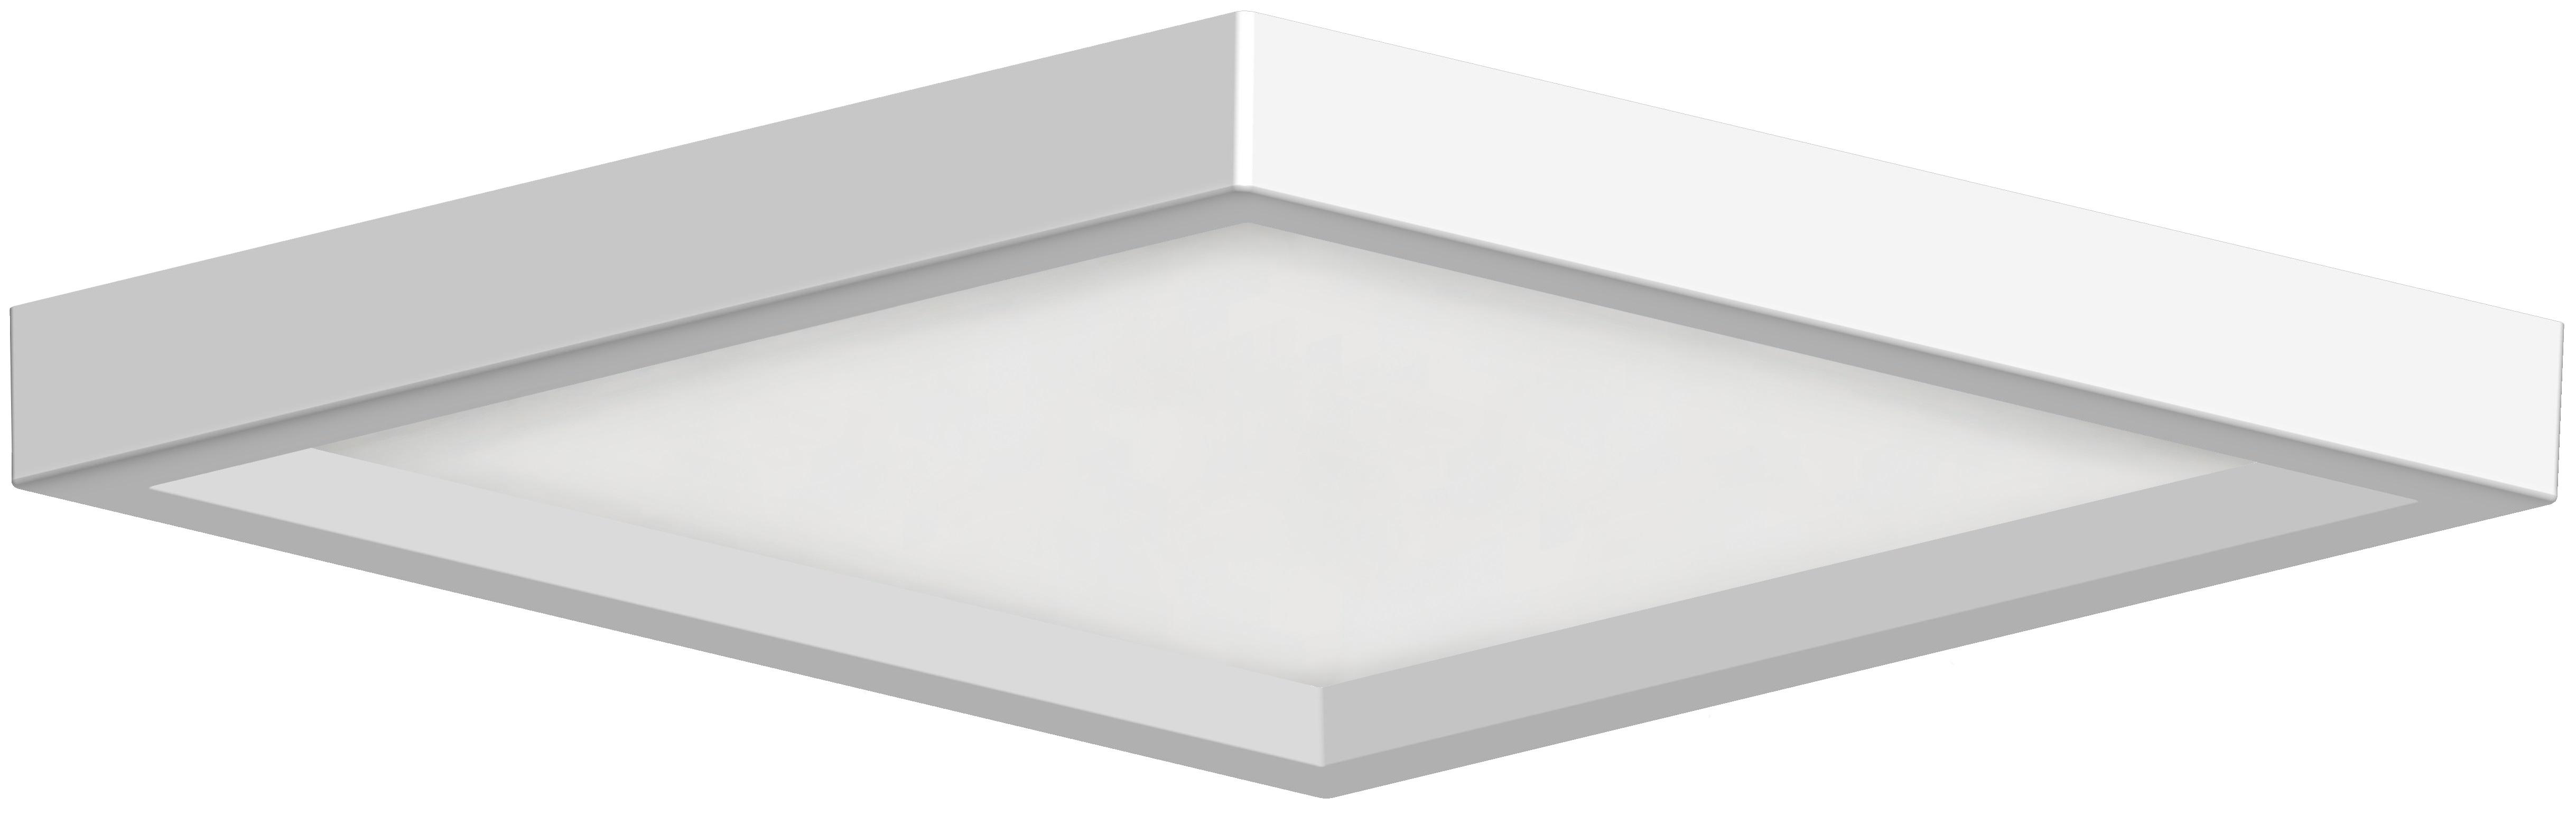 6 Low Profile Square Ceiling Mount Rp Lighting Fans